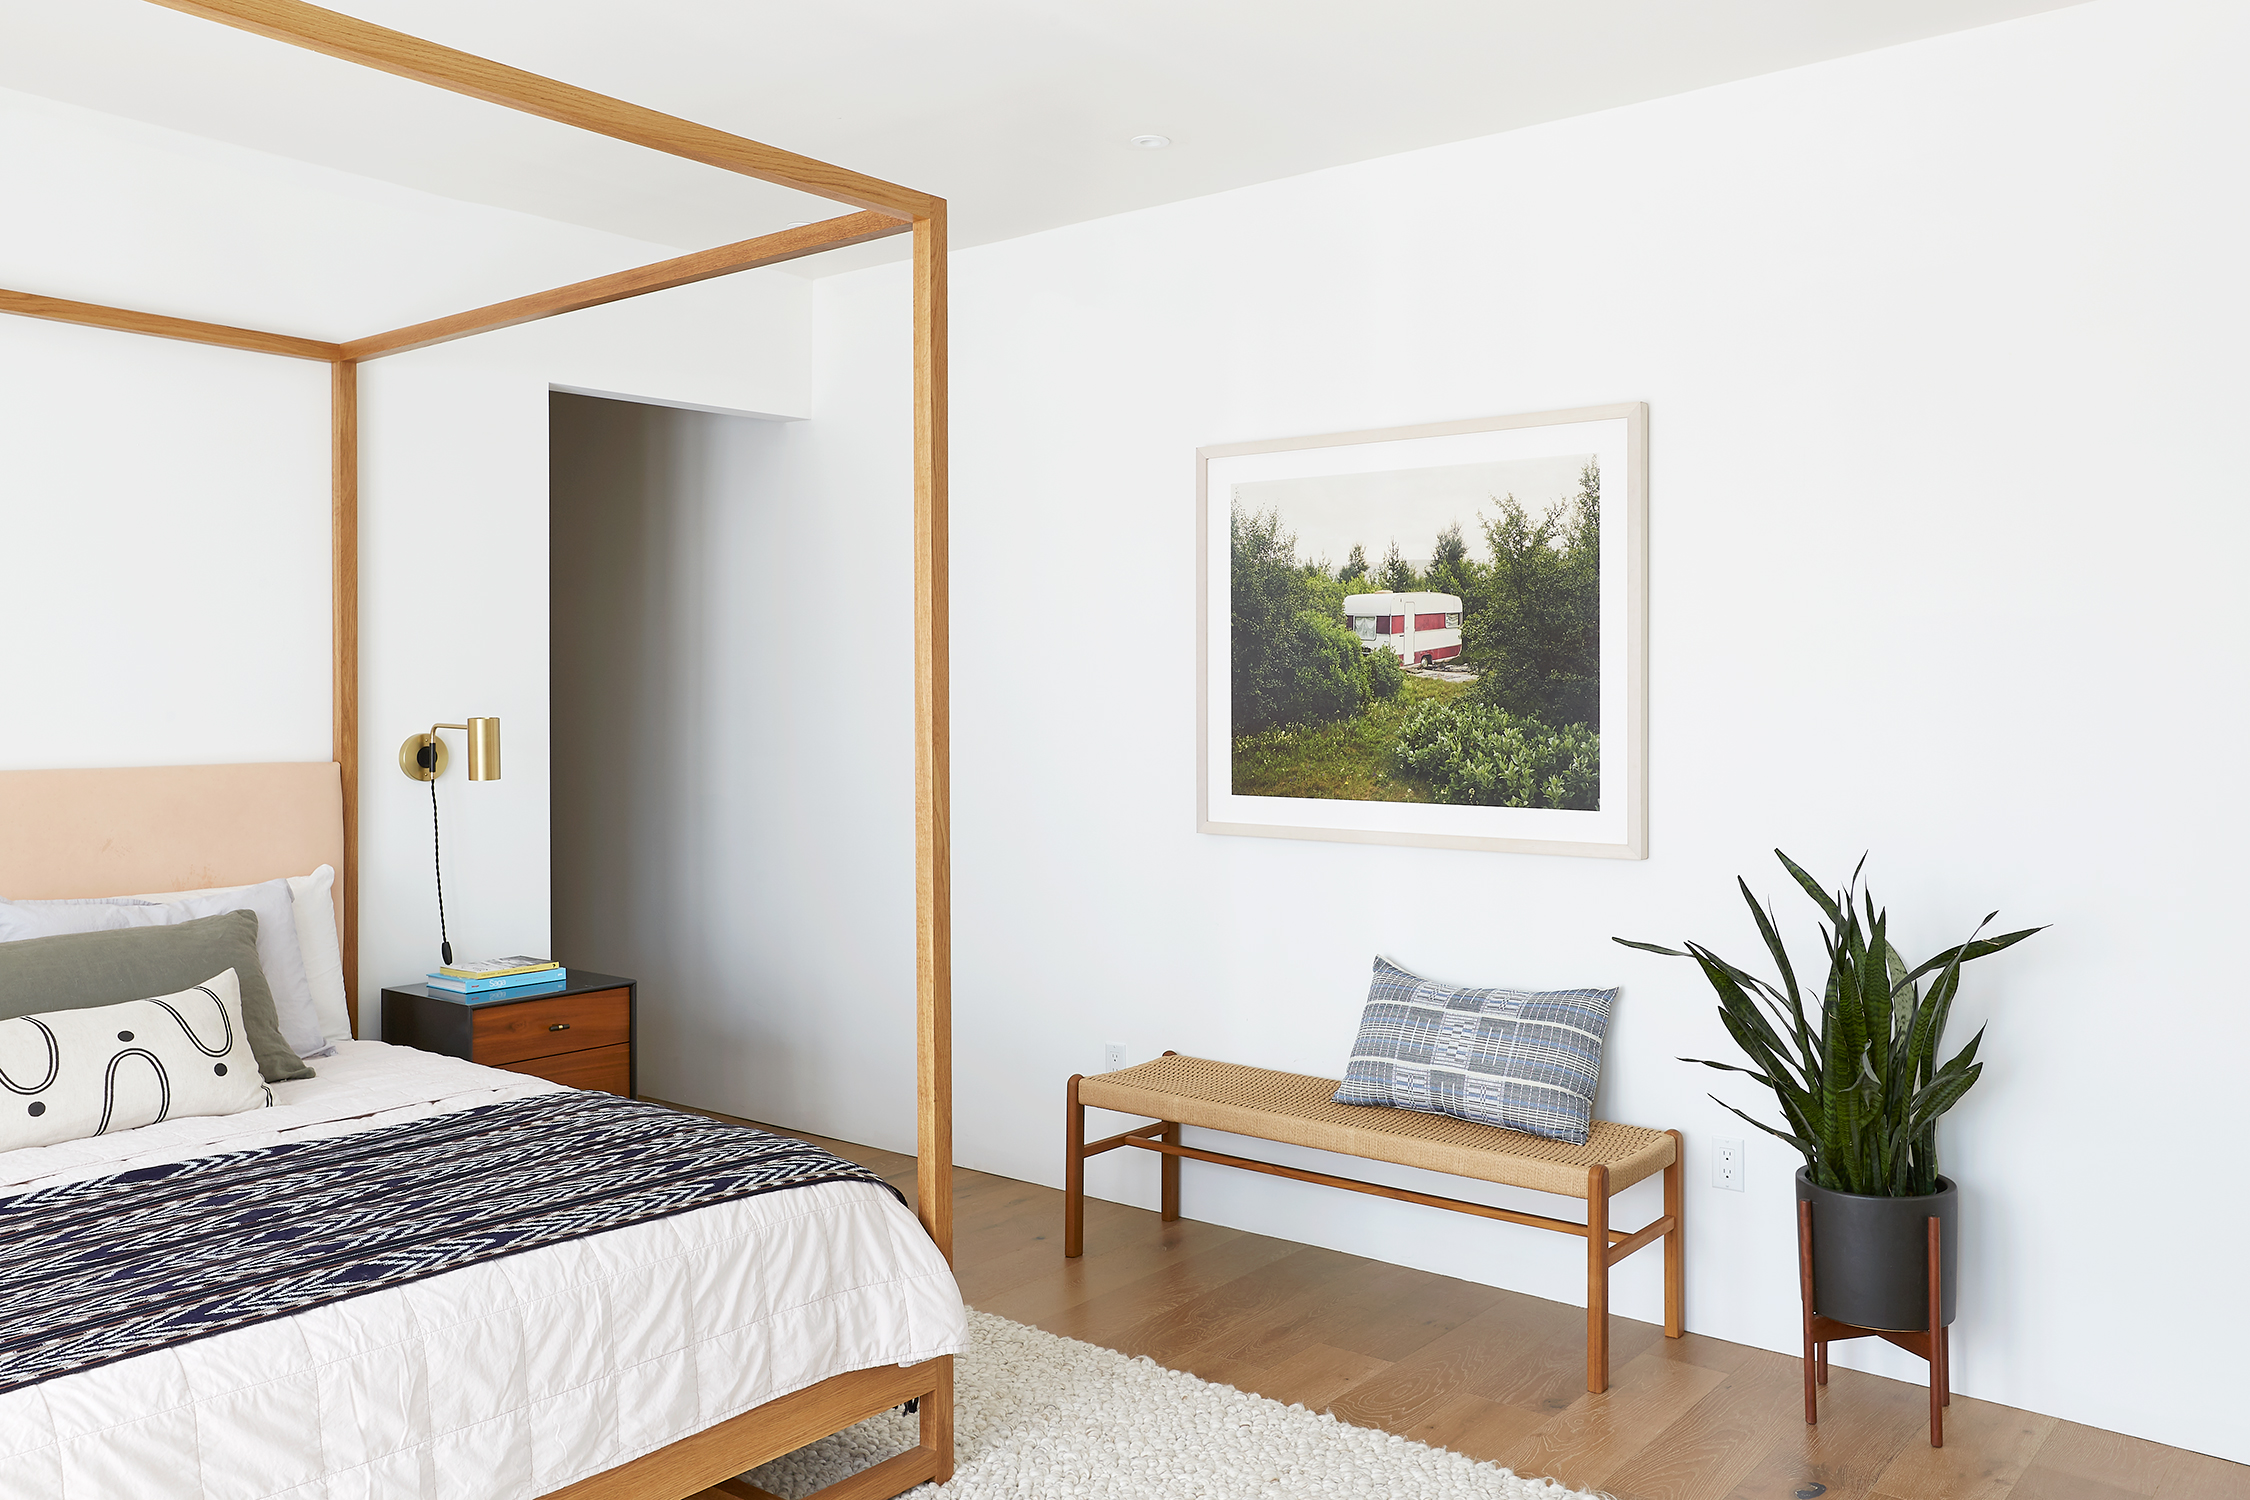 Interior design by Natalie Myers | Lonny